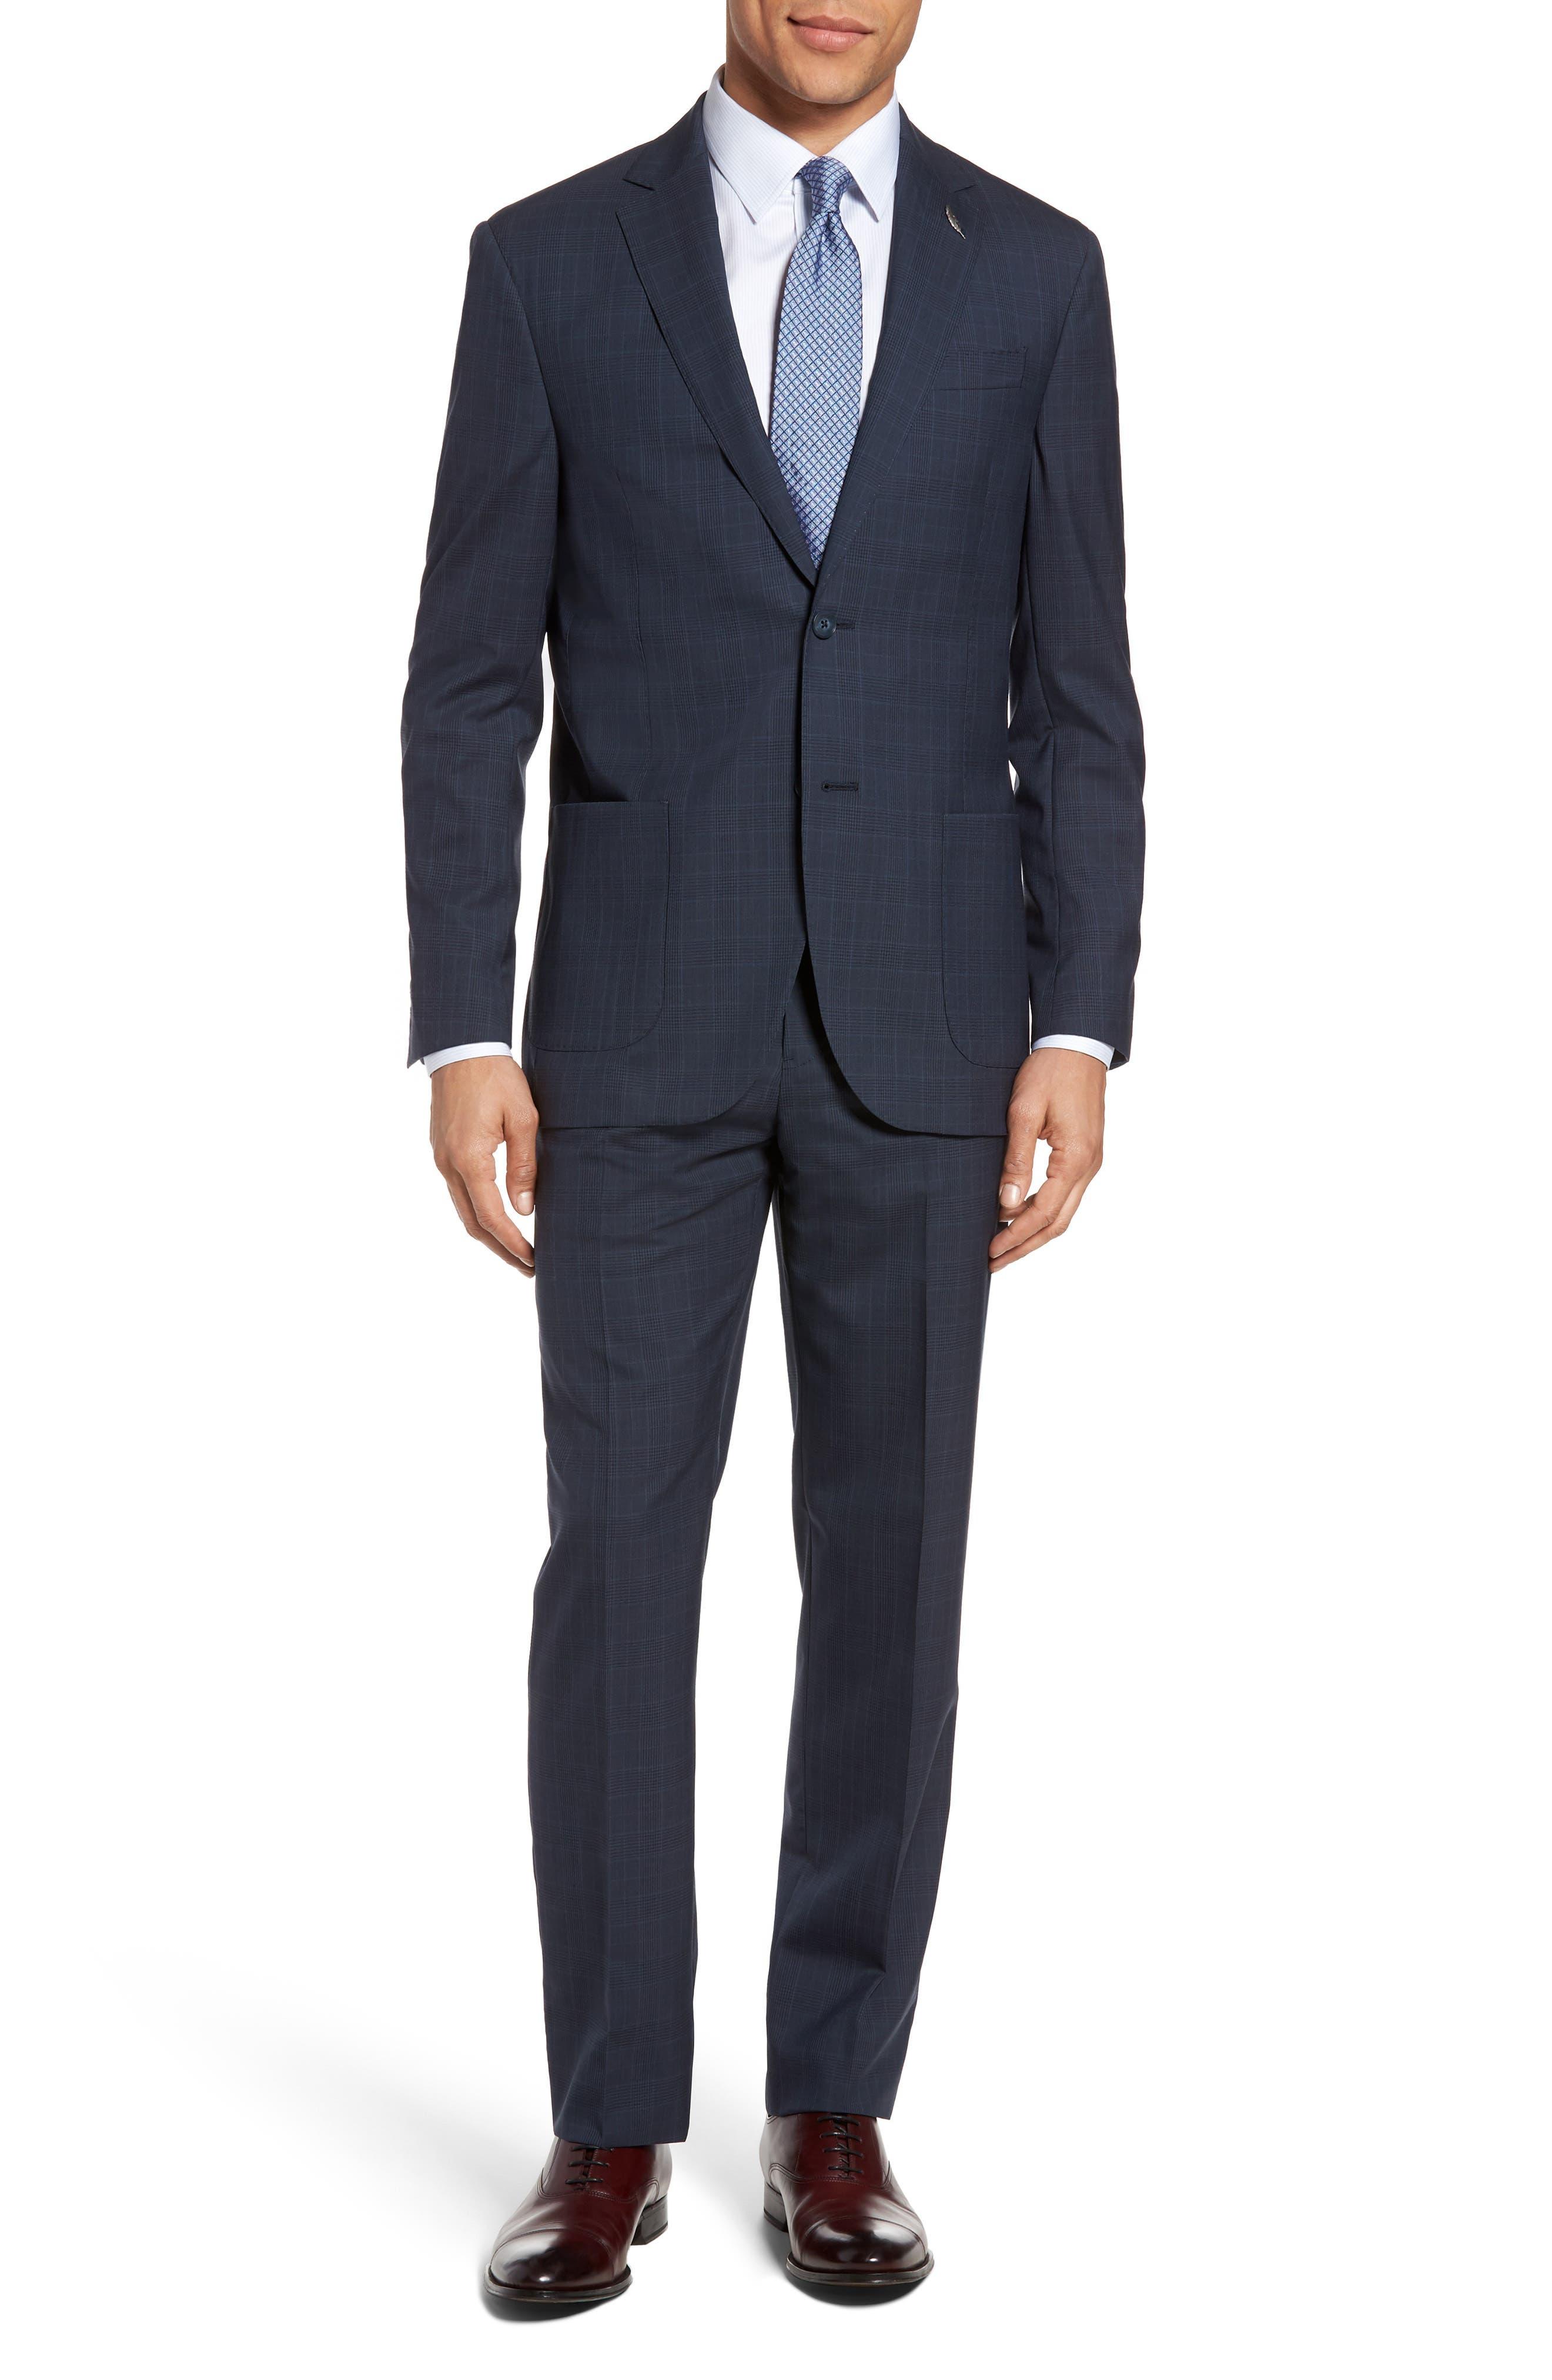 Alternate Image 1 Selected - Michael Bastian Classic Fit Plaid Wool Suit